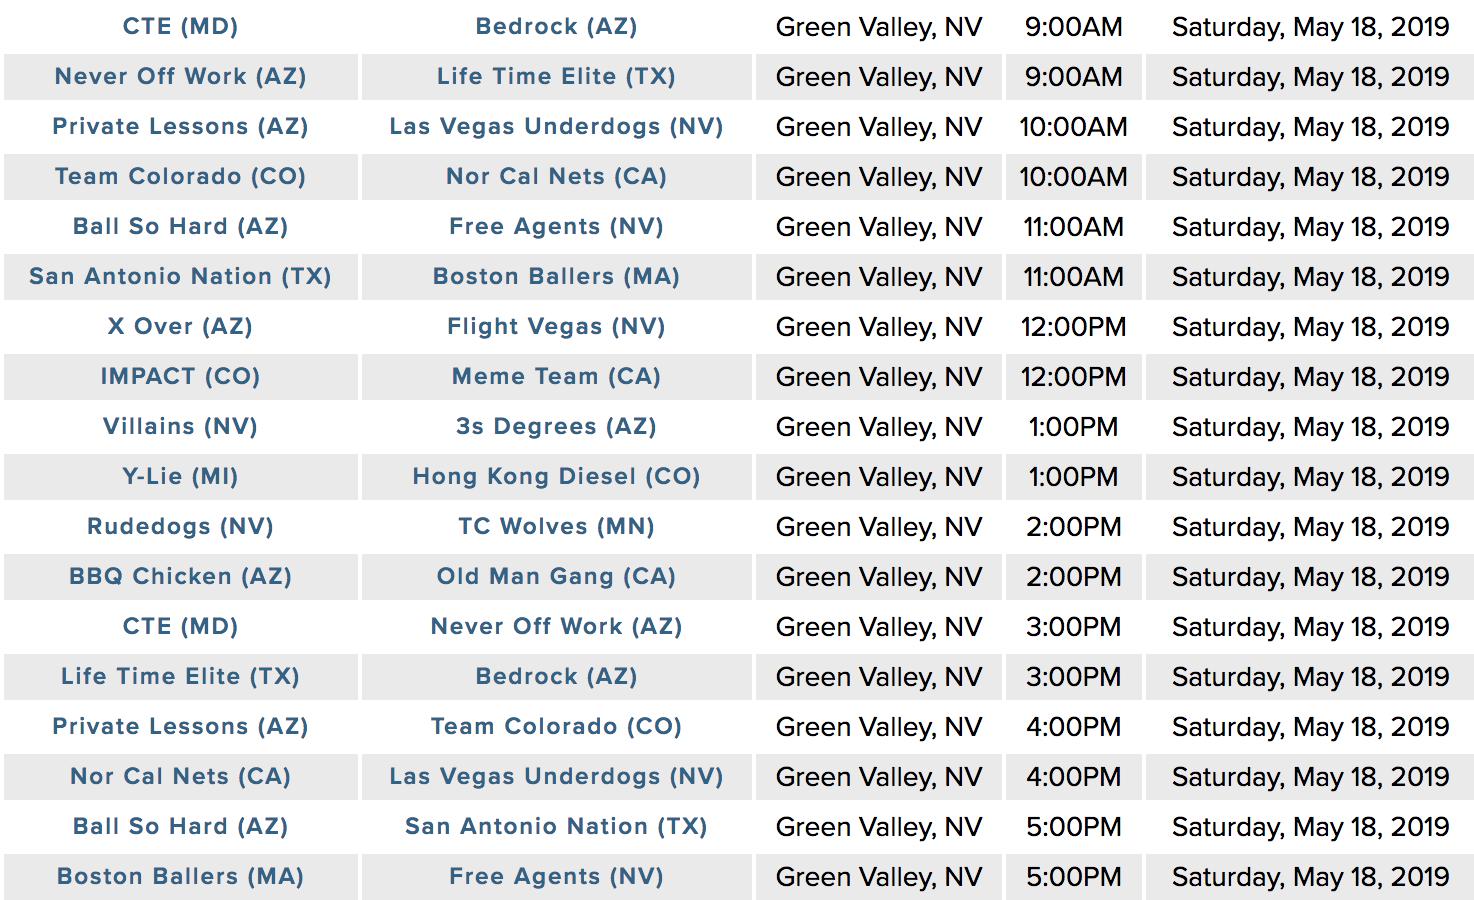 Saturday's schedule